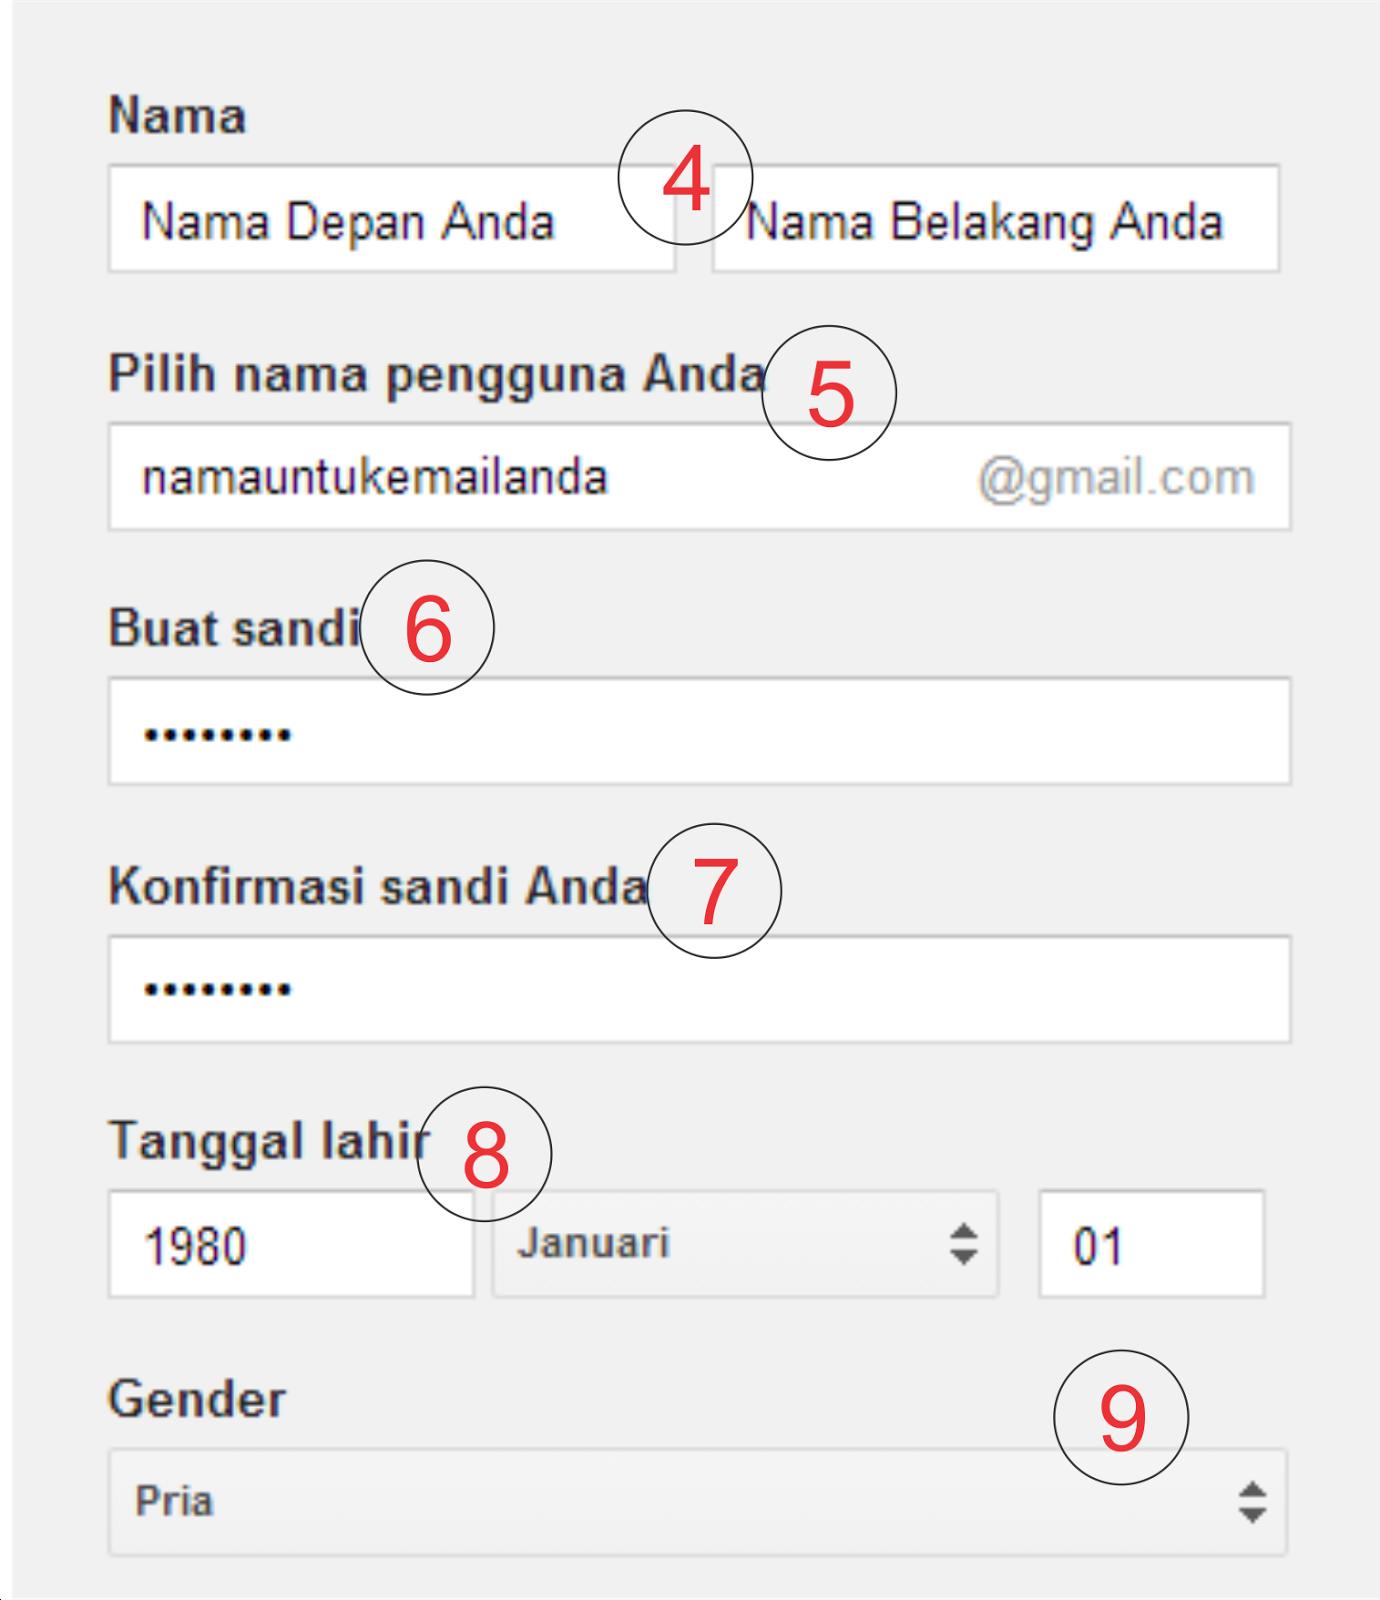 http://muftiblogger.blogspot.com/2015/01/cara-membuat-email-google.html